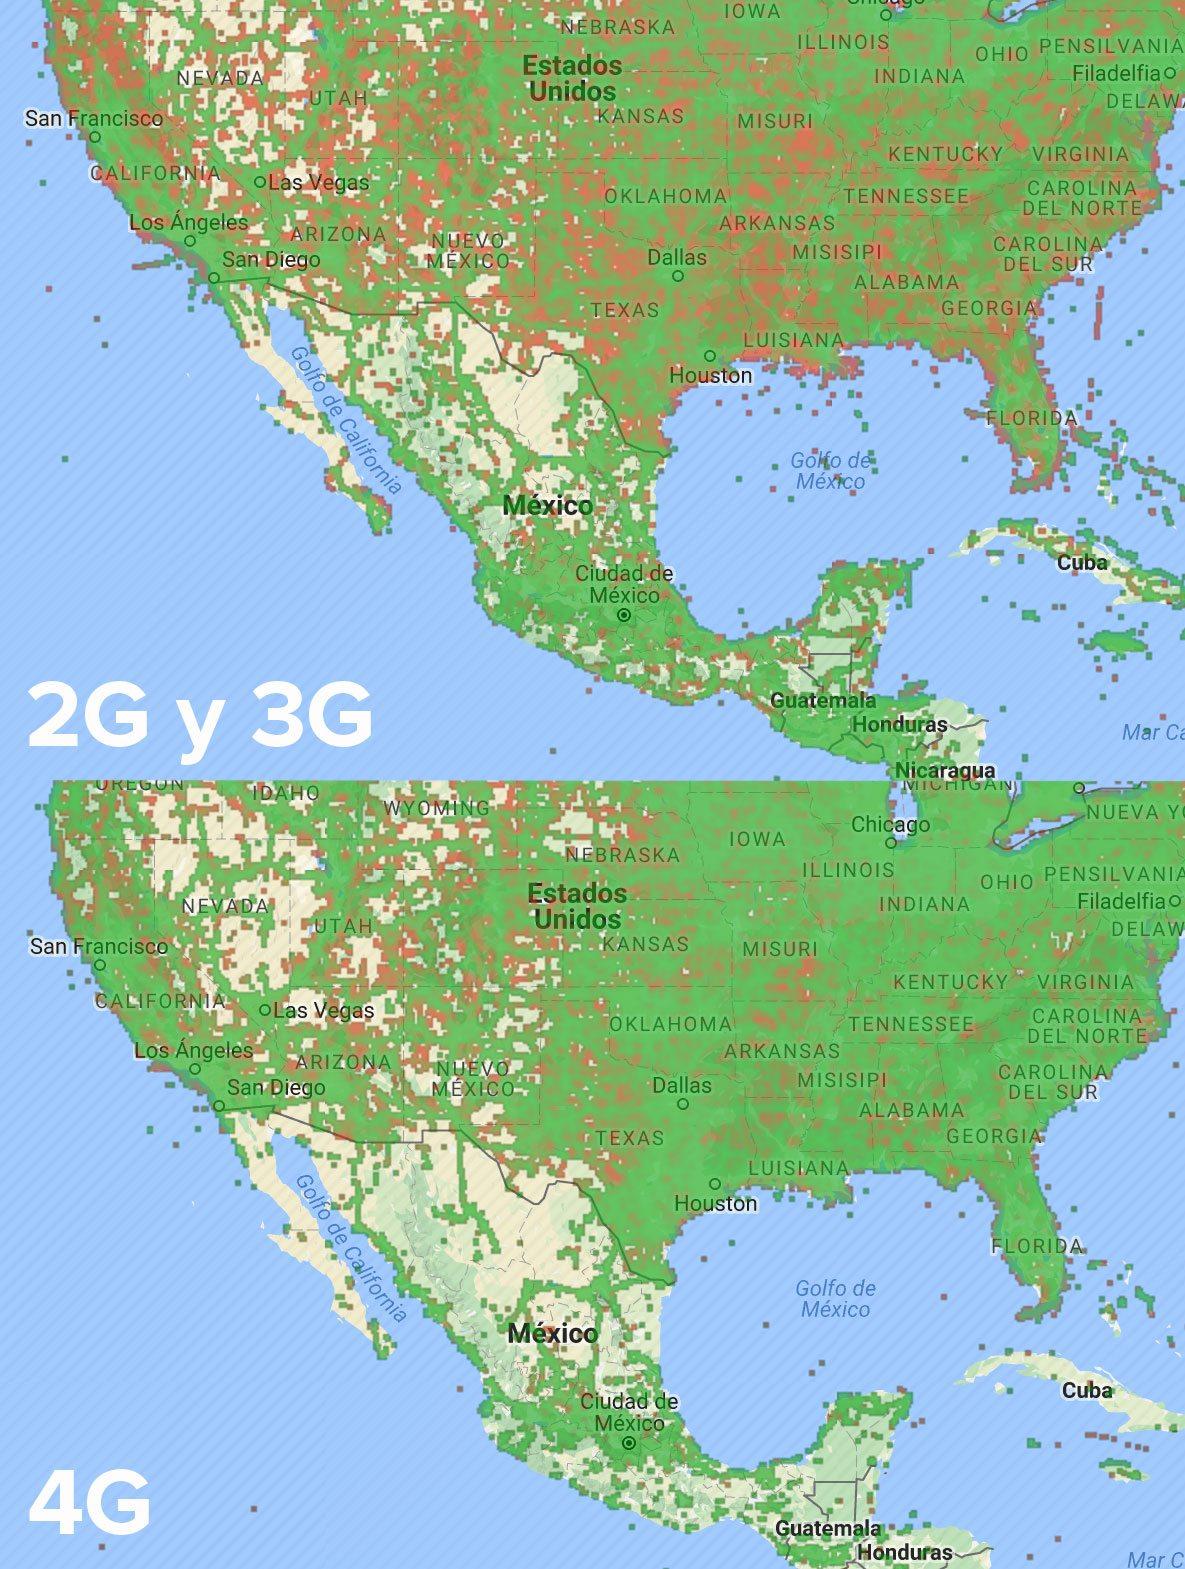 Comparativo de cobertura 2G y 3G frente a 4G, de acuerdo con datos de Open Signal.